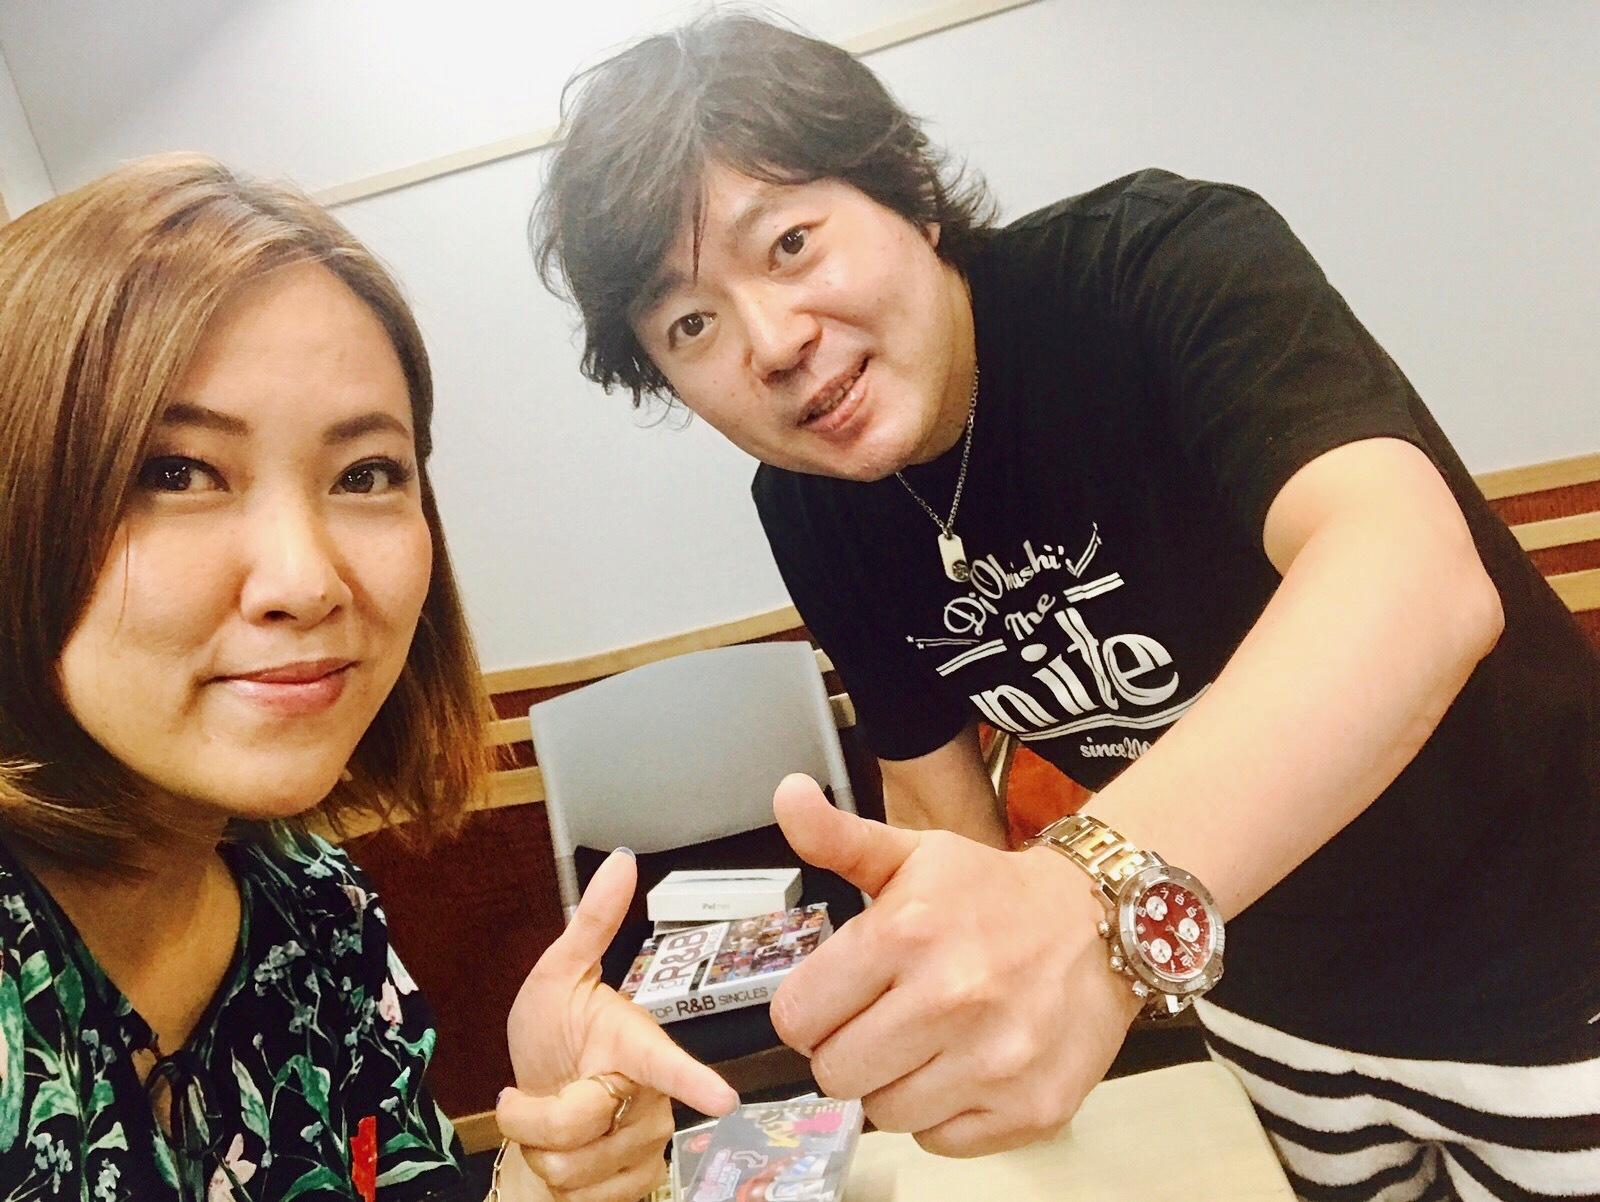 Music Bird DJ大西貴文さんの「THE NITE」ゲスト_a0150139_15391774.jpg